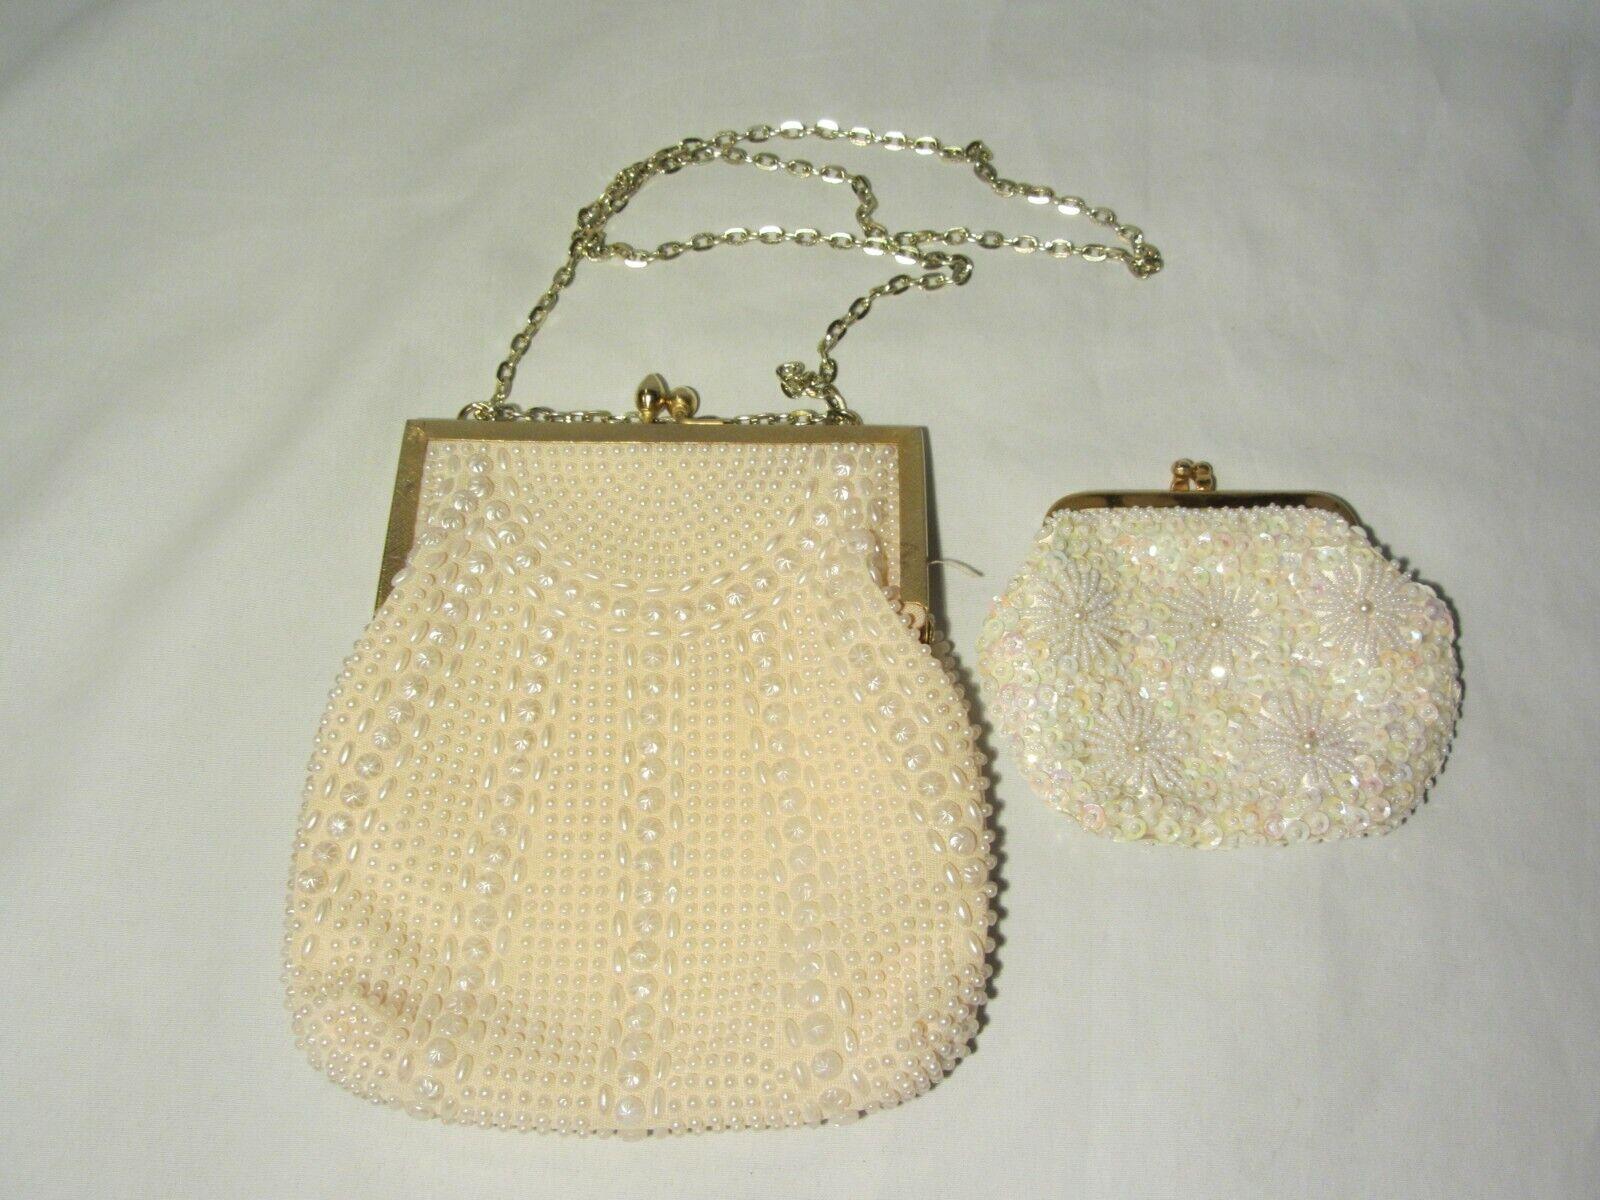 Vintage Fine Arts Bag Co. White Beaded Blush Handbag w/ Sequin Change Purse